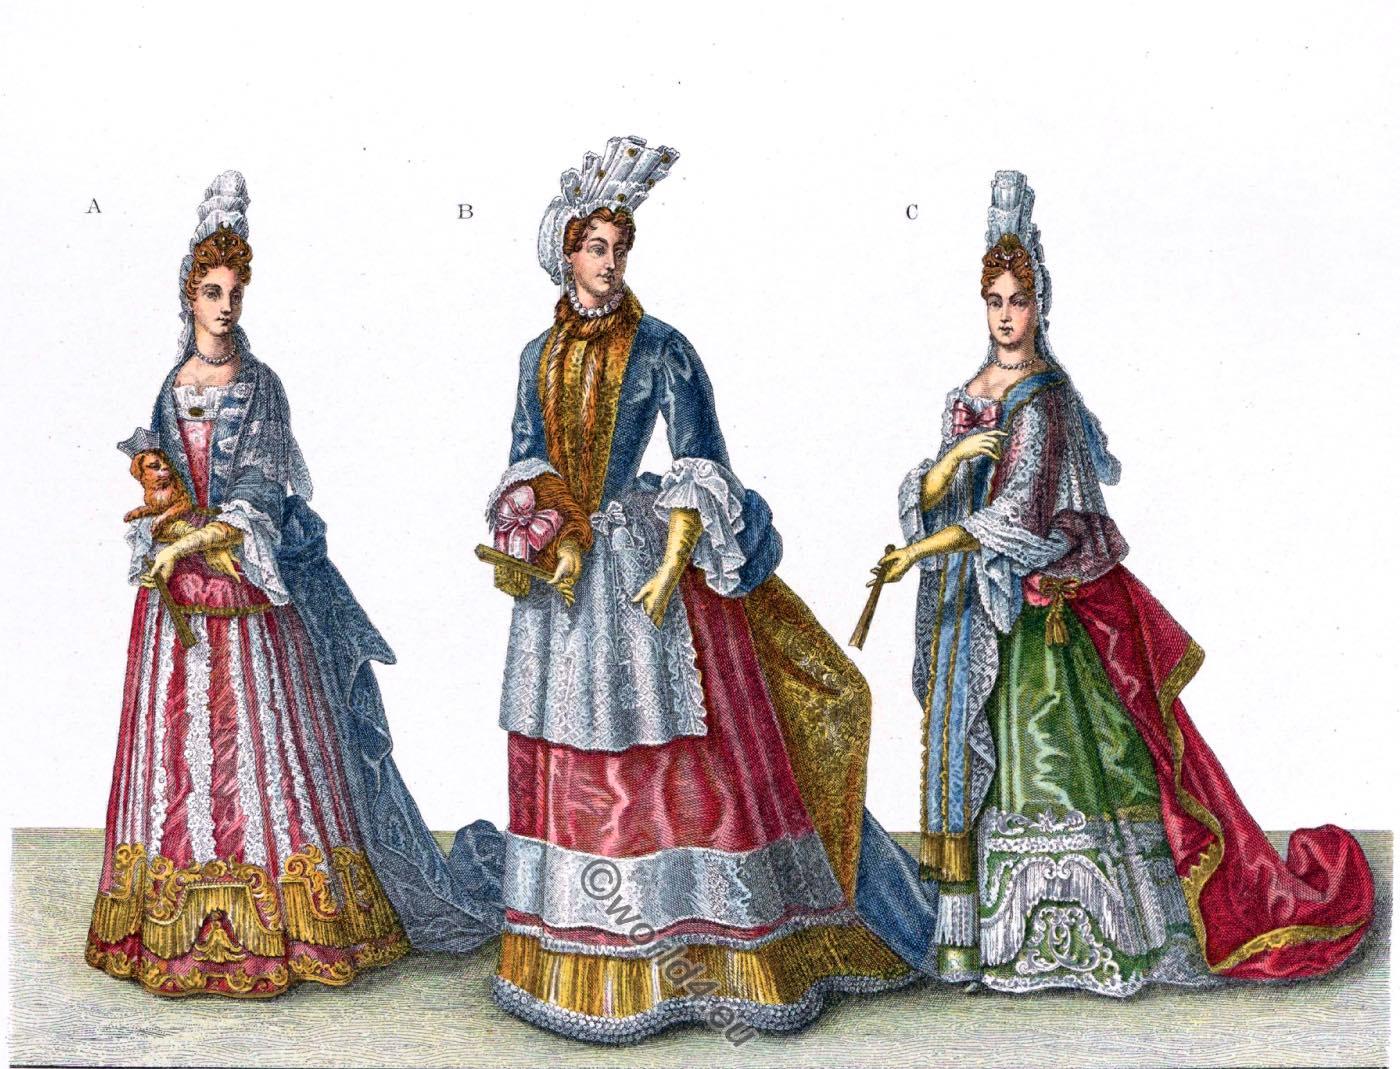 coiffure, Fontanges, Louis XIV, Versailles, court, Baroque, fashion, mode, costumes